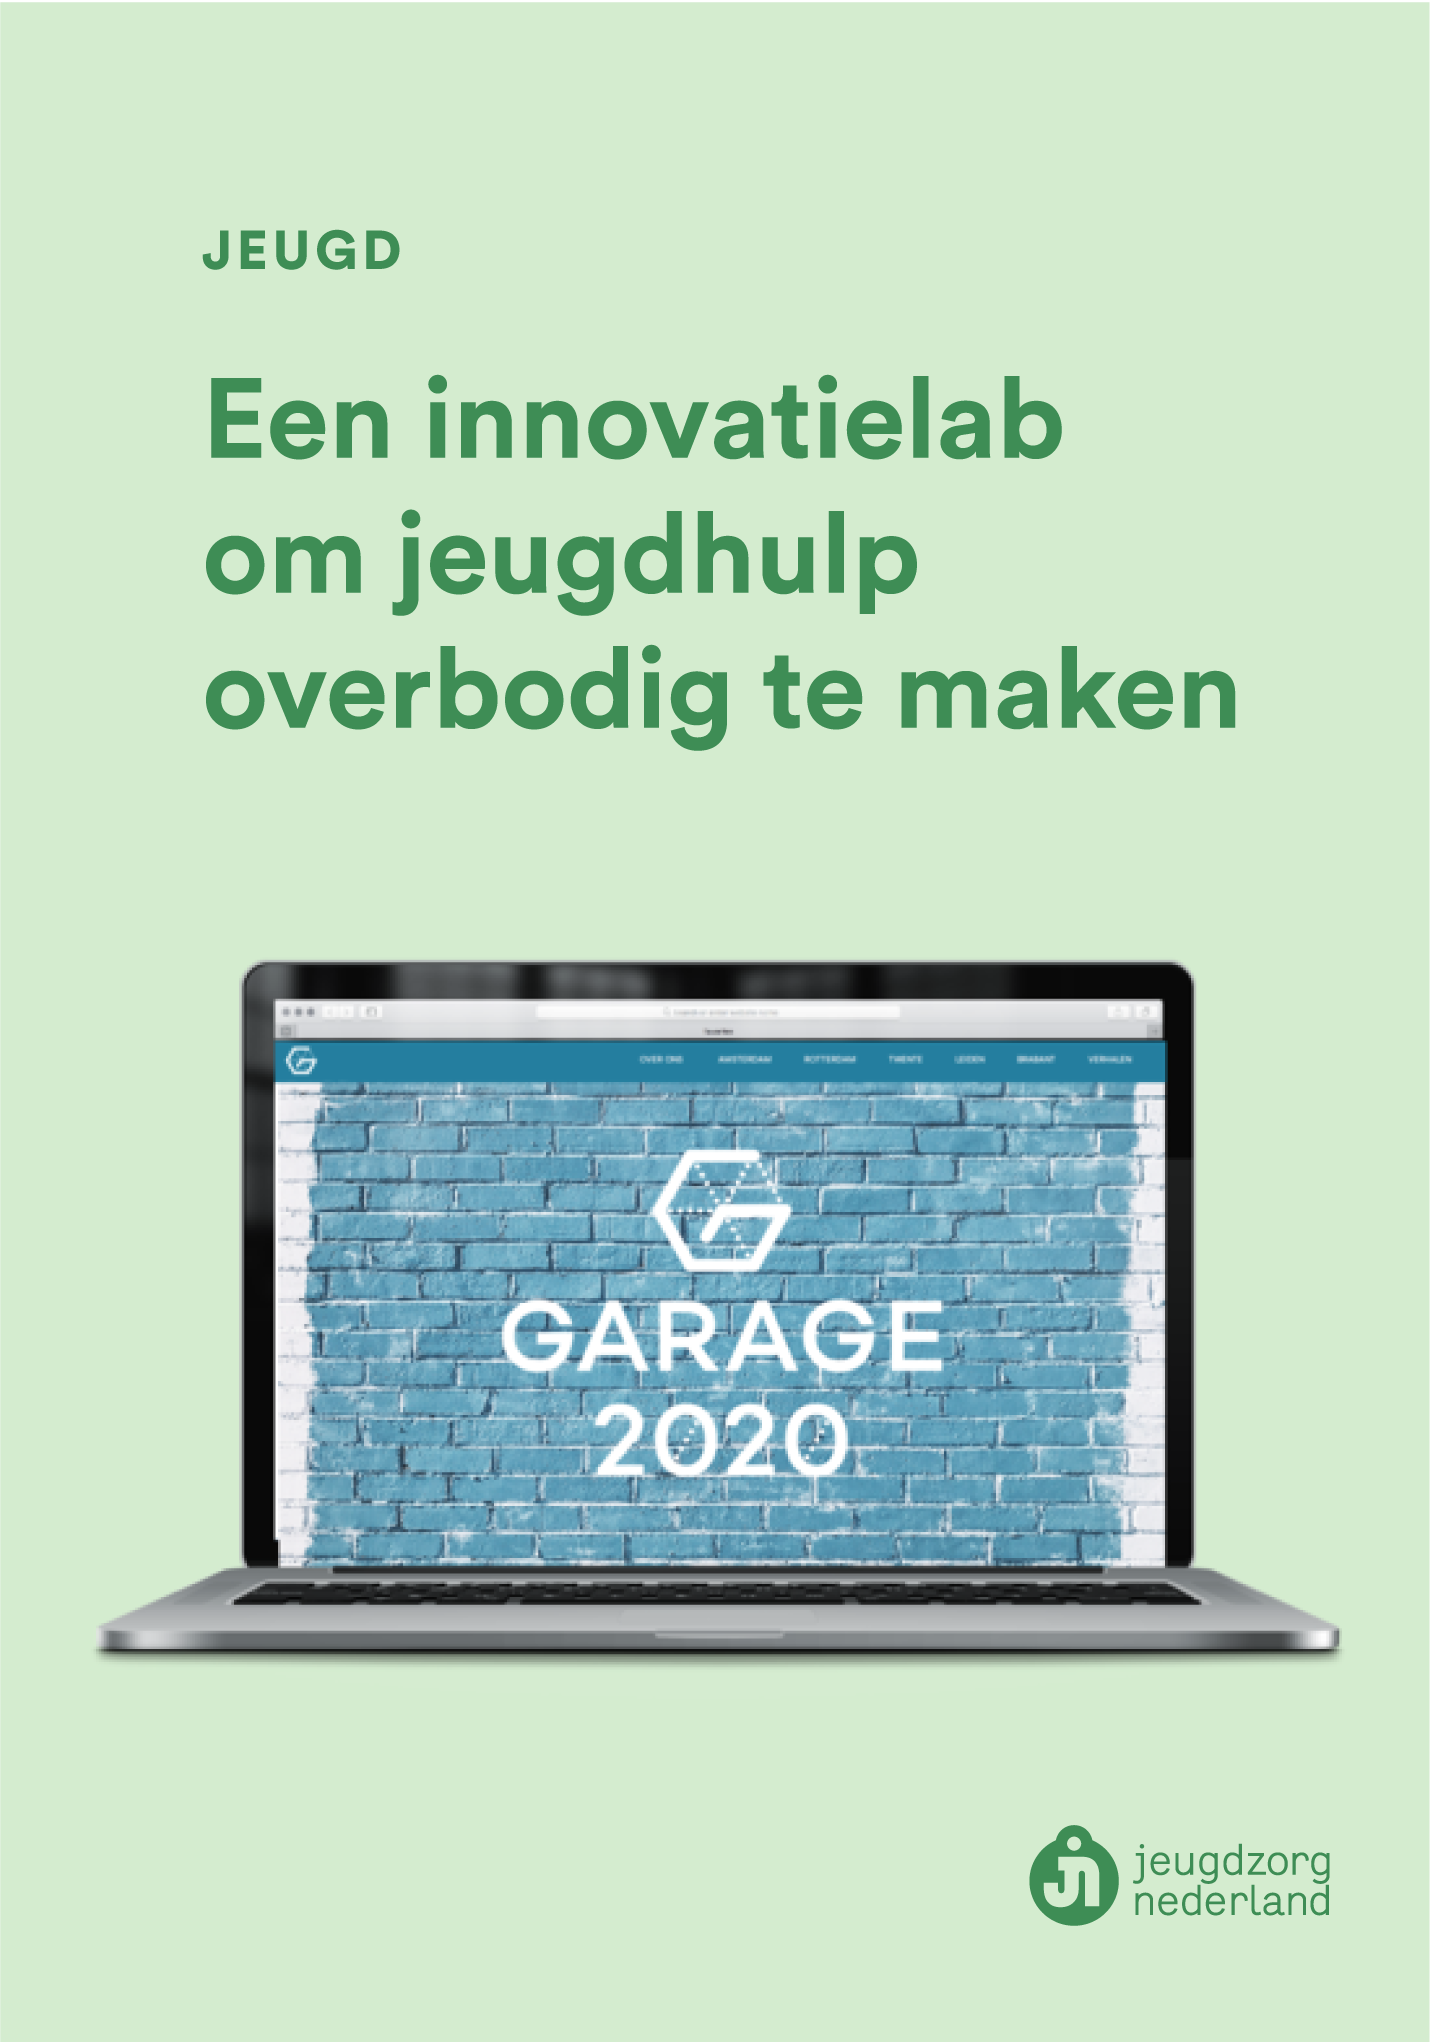 Project - Jeugdzorg nederland - Een innovatielab om jeugdhulp overbodig te maken